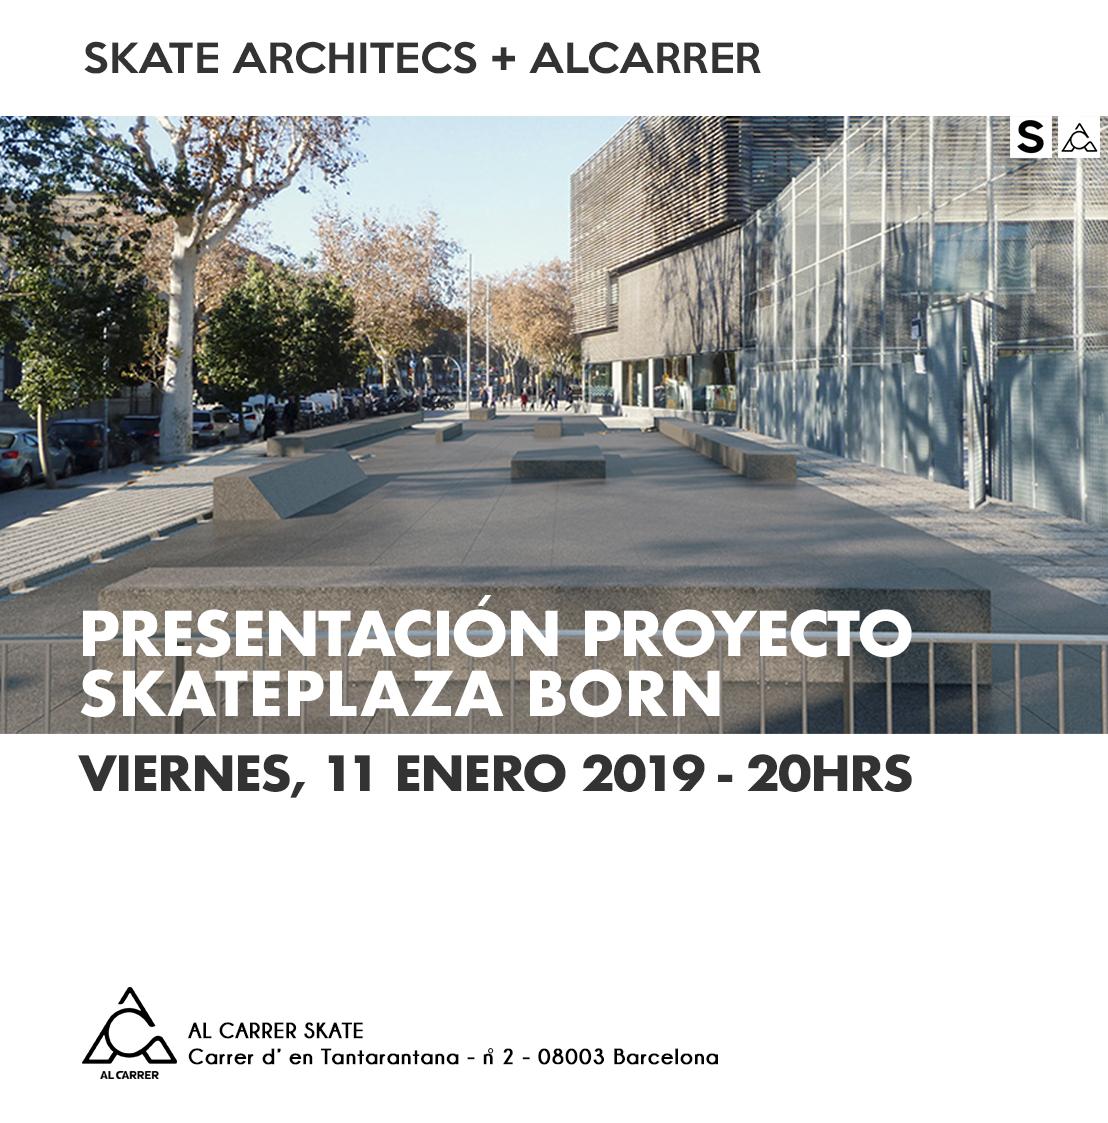 SKATE-ARCHITECTS-AL-CARRER-SKATEPLAZA_BARCELONA-BORN-CIUTADELLA-32AC-4750-9AD7-8B6540F60FB2.jpeg